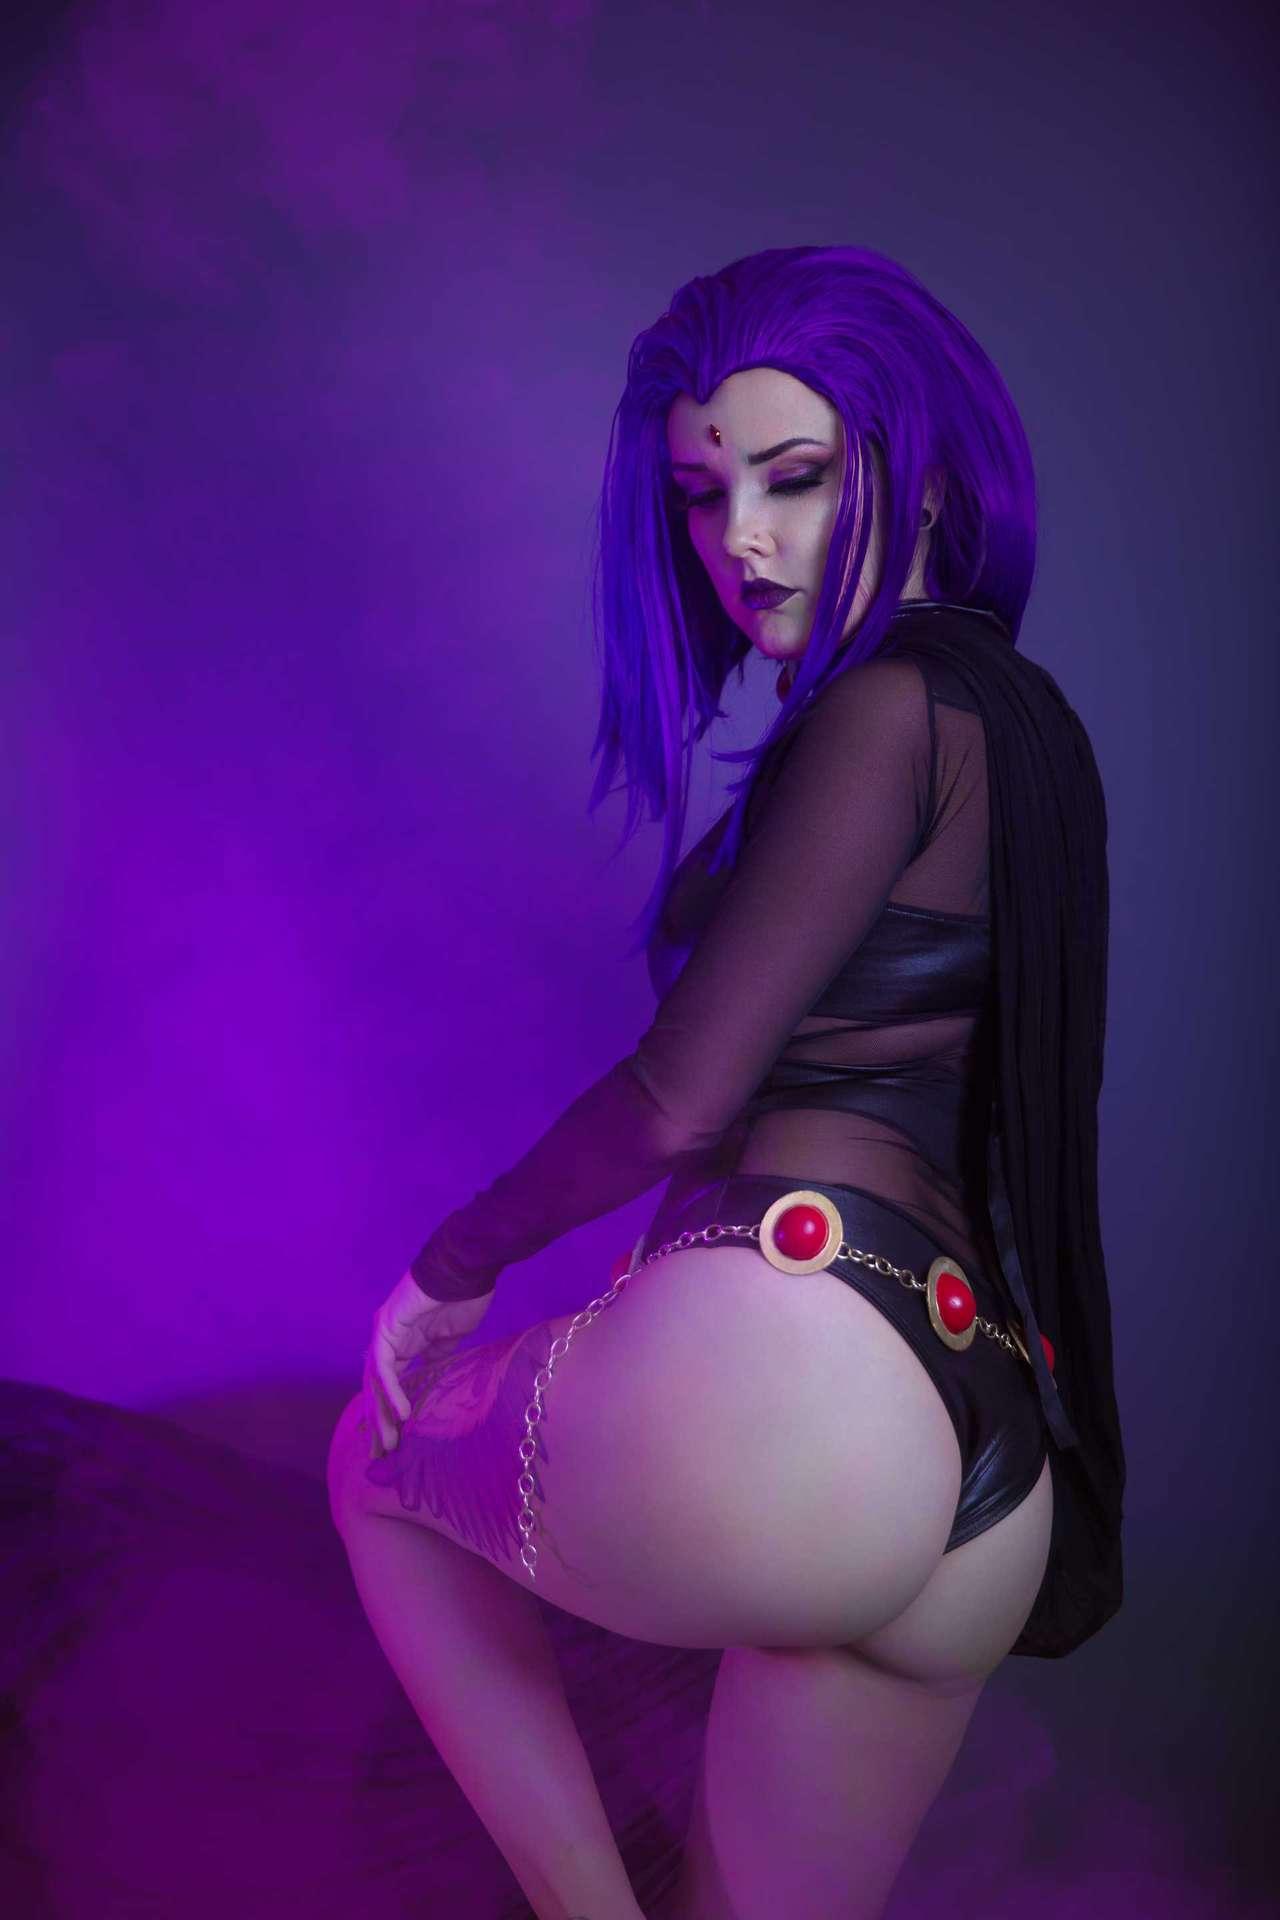 Raven cosplay sex